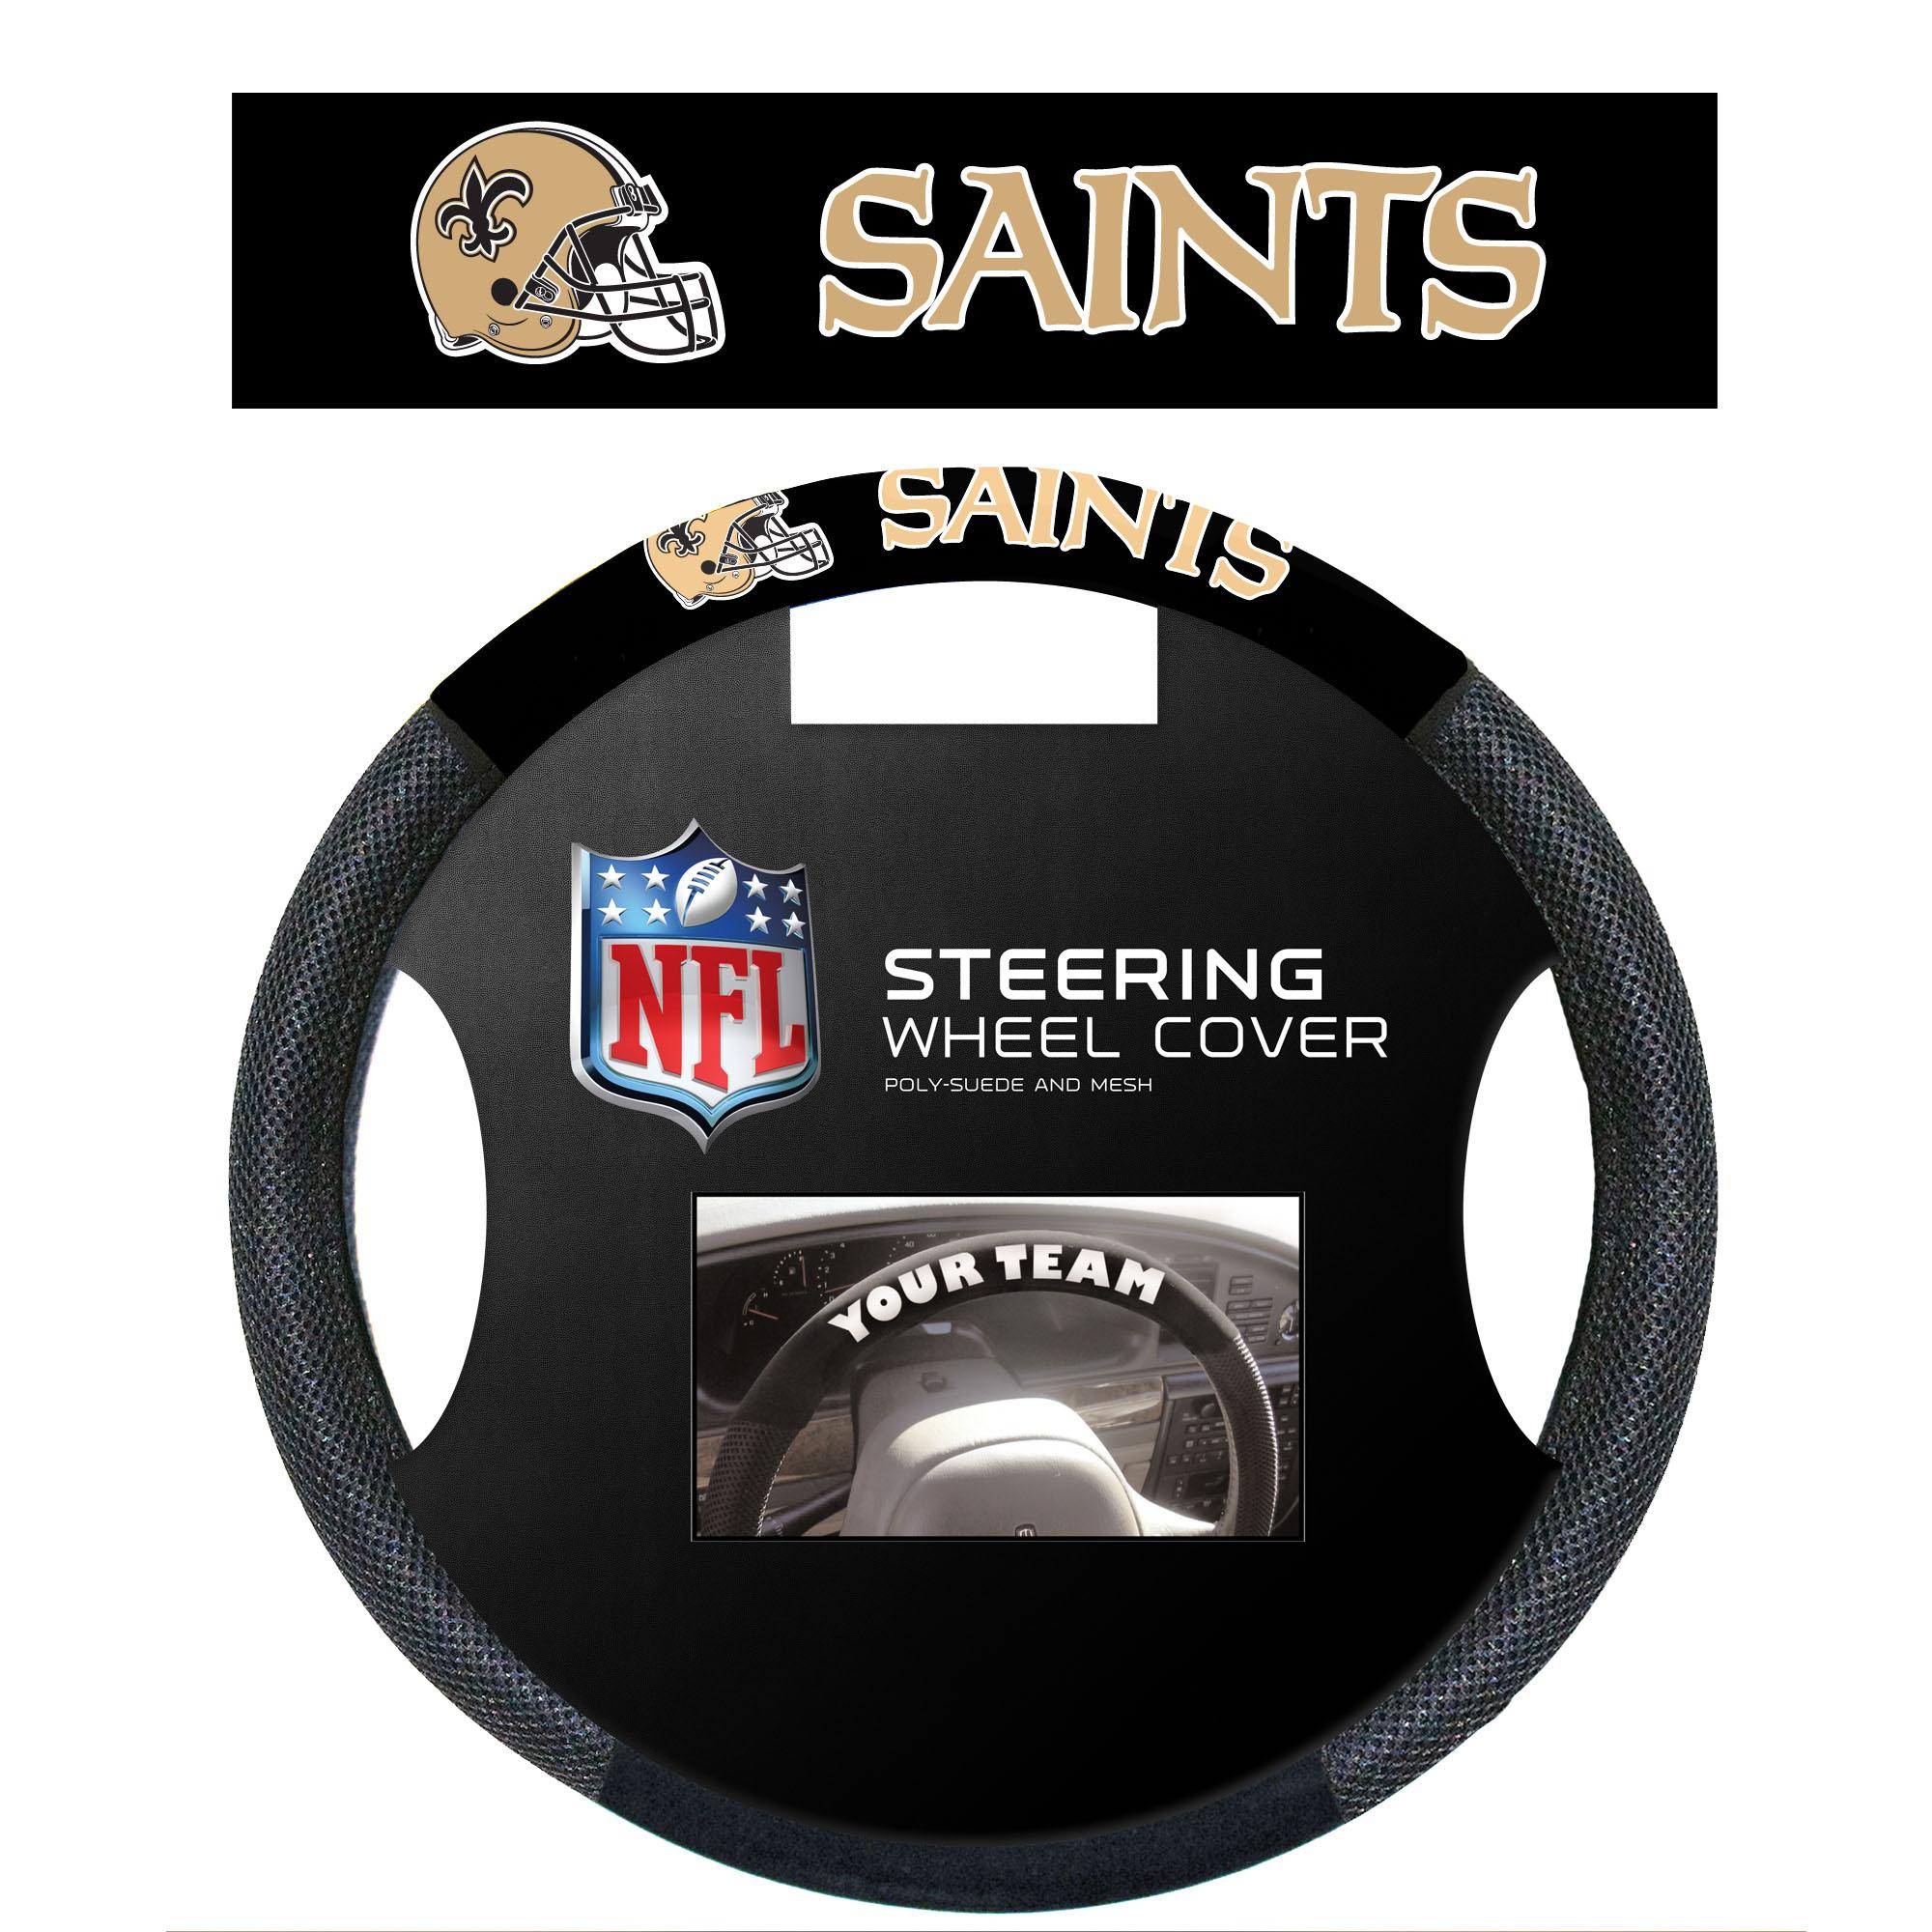 NFL New Orleans SAINTS Steering Wheel Cover